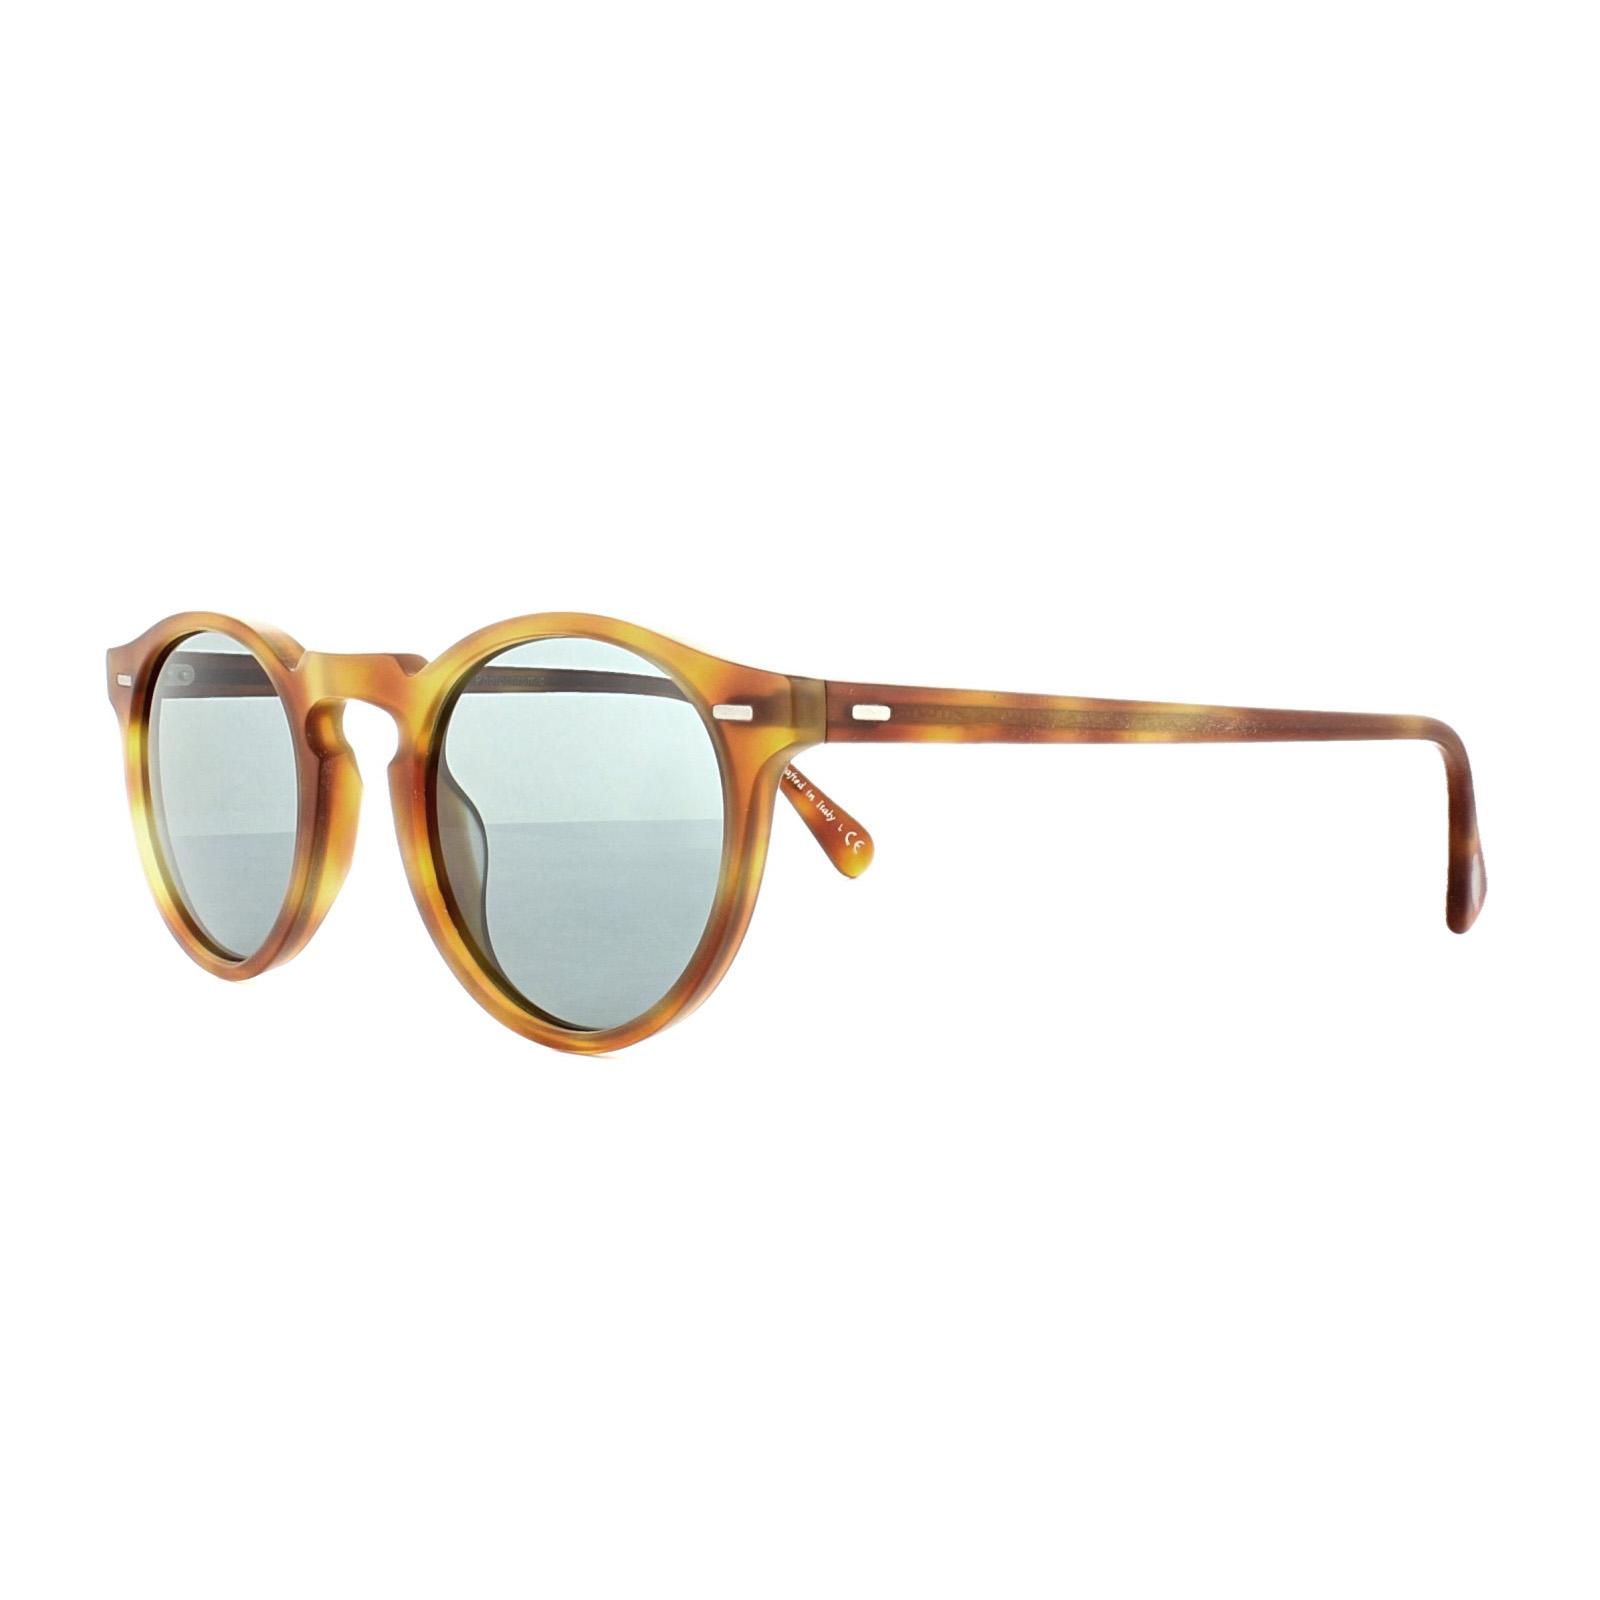 Oliver Peoples Gregory Peck Sun Sonnenbrille Hellbraun und Tortoise 1483R8 47mm 5JvB98r